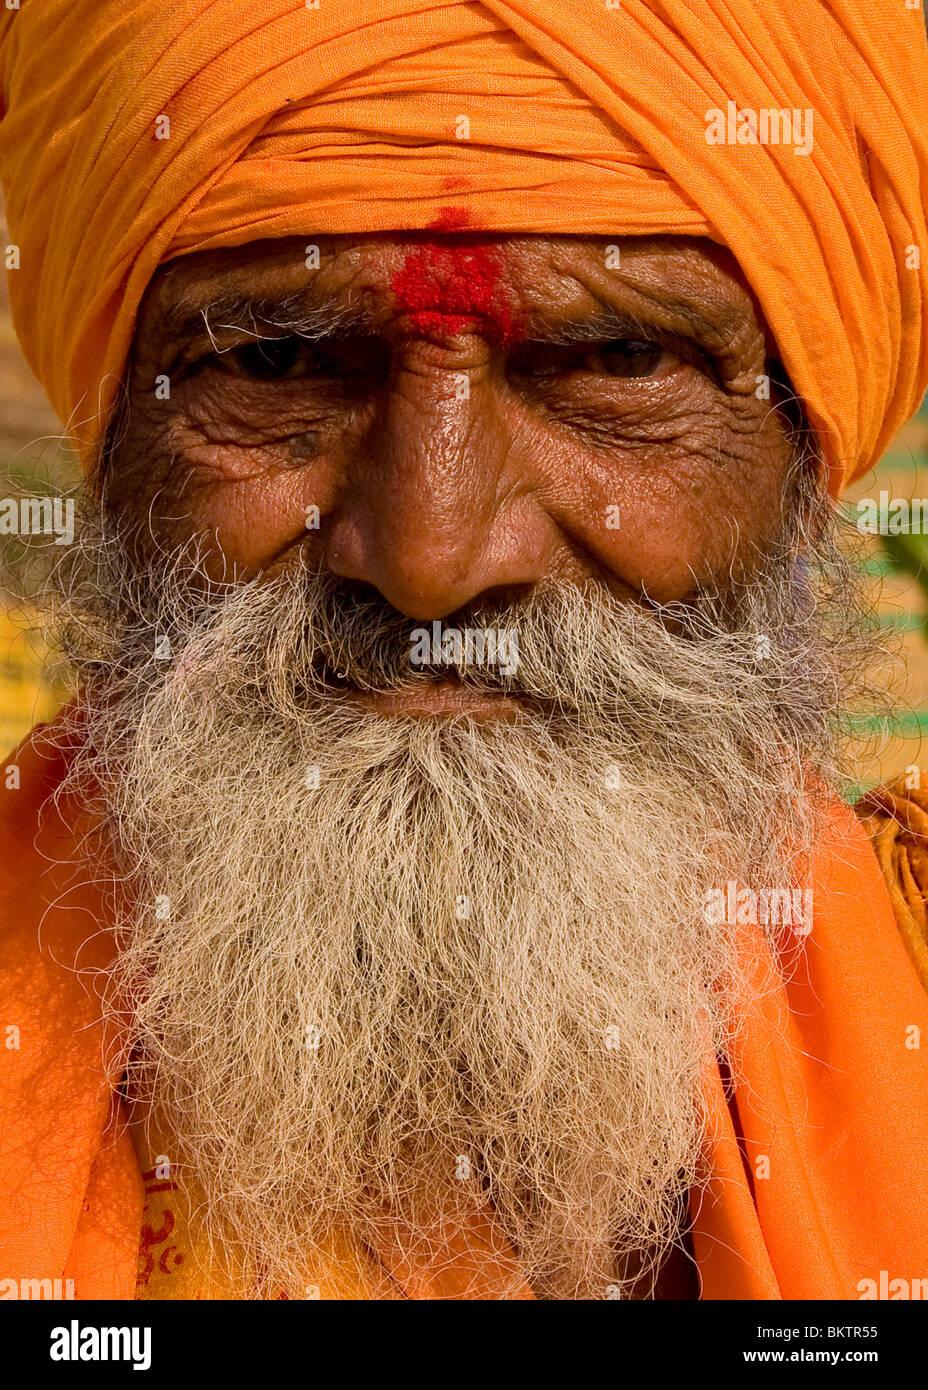 Hombre santo, Varanasi, India Imagen De Stock